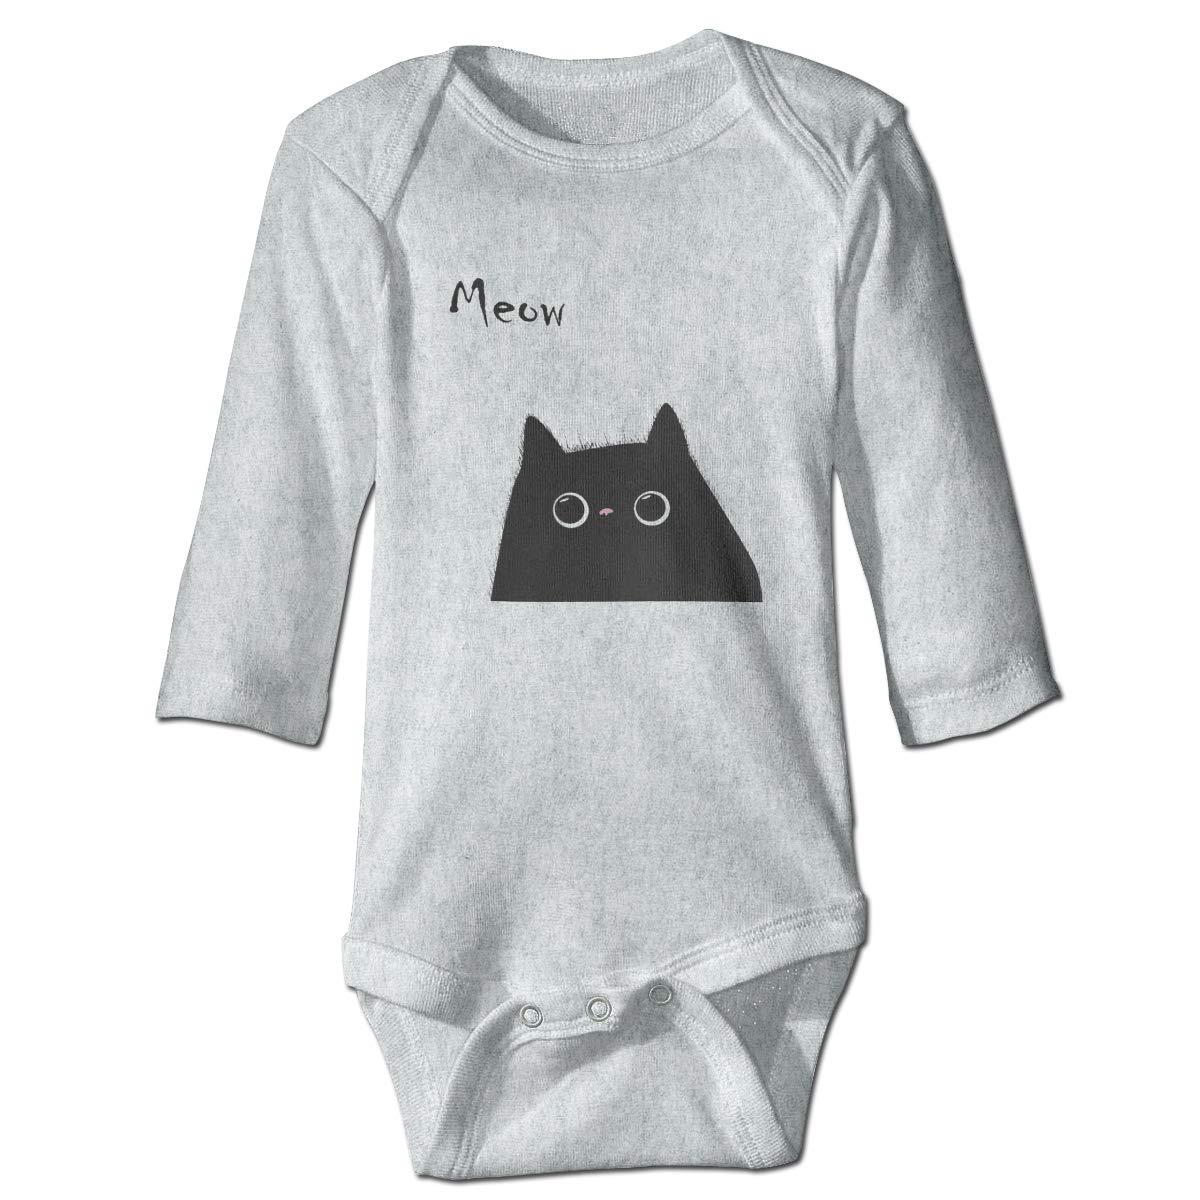 Baby Long Sleeve Meow Cat Lover Onesies Bodysuit Cotton Romper Pajamas